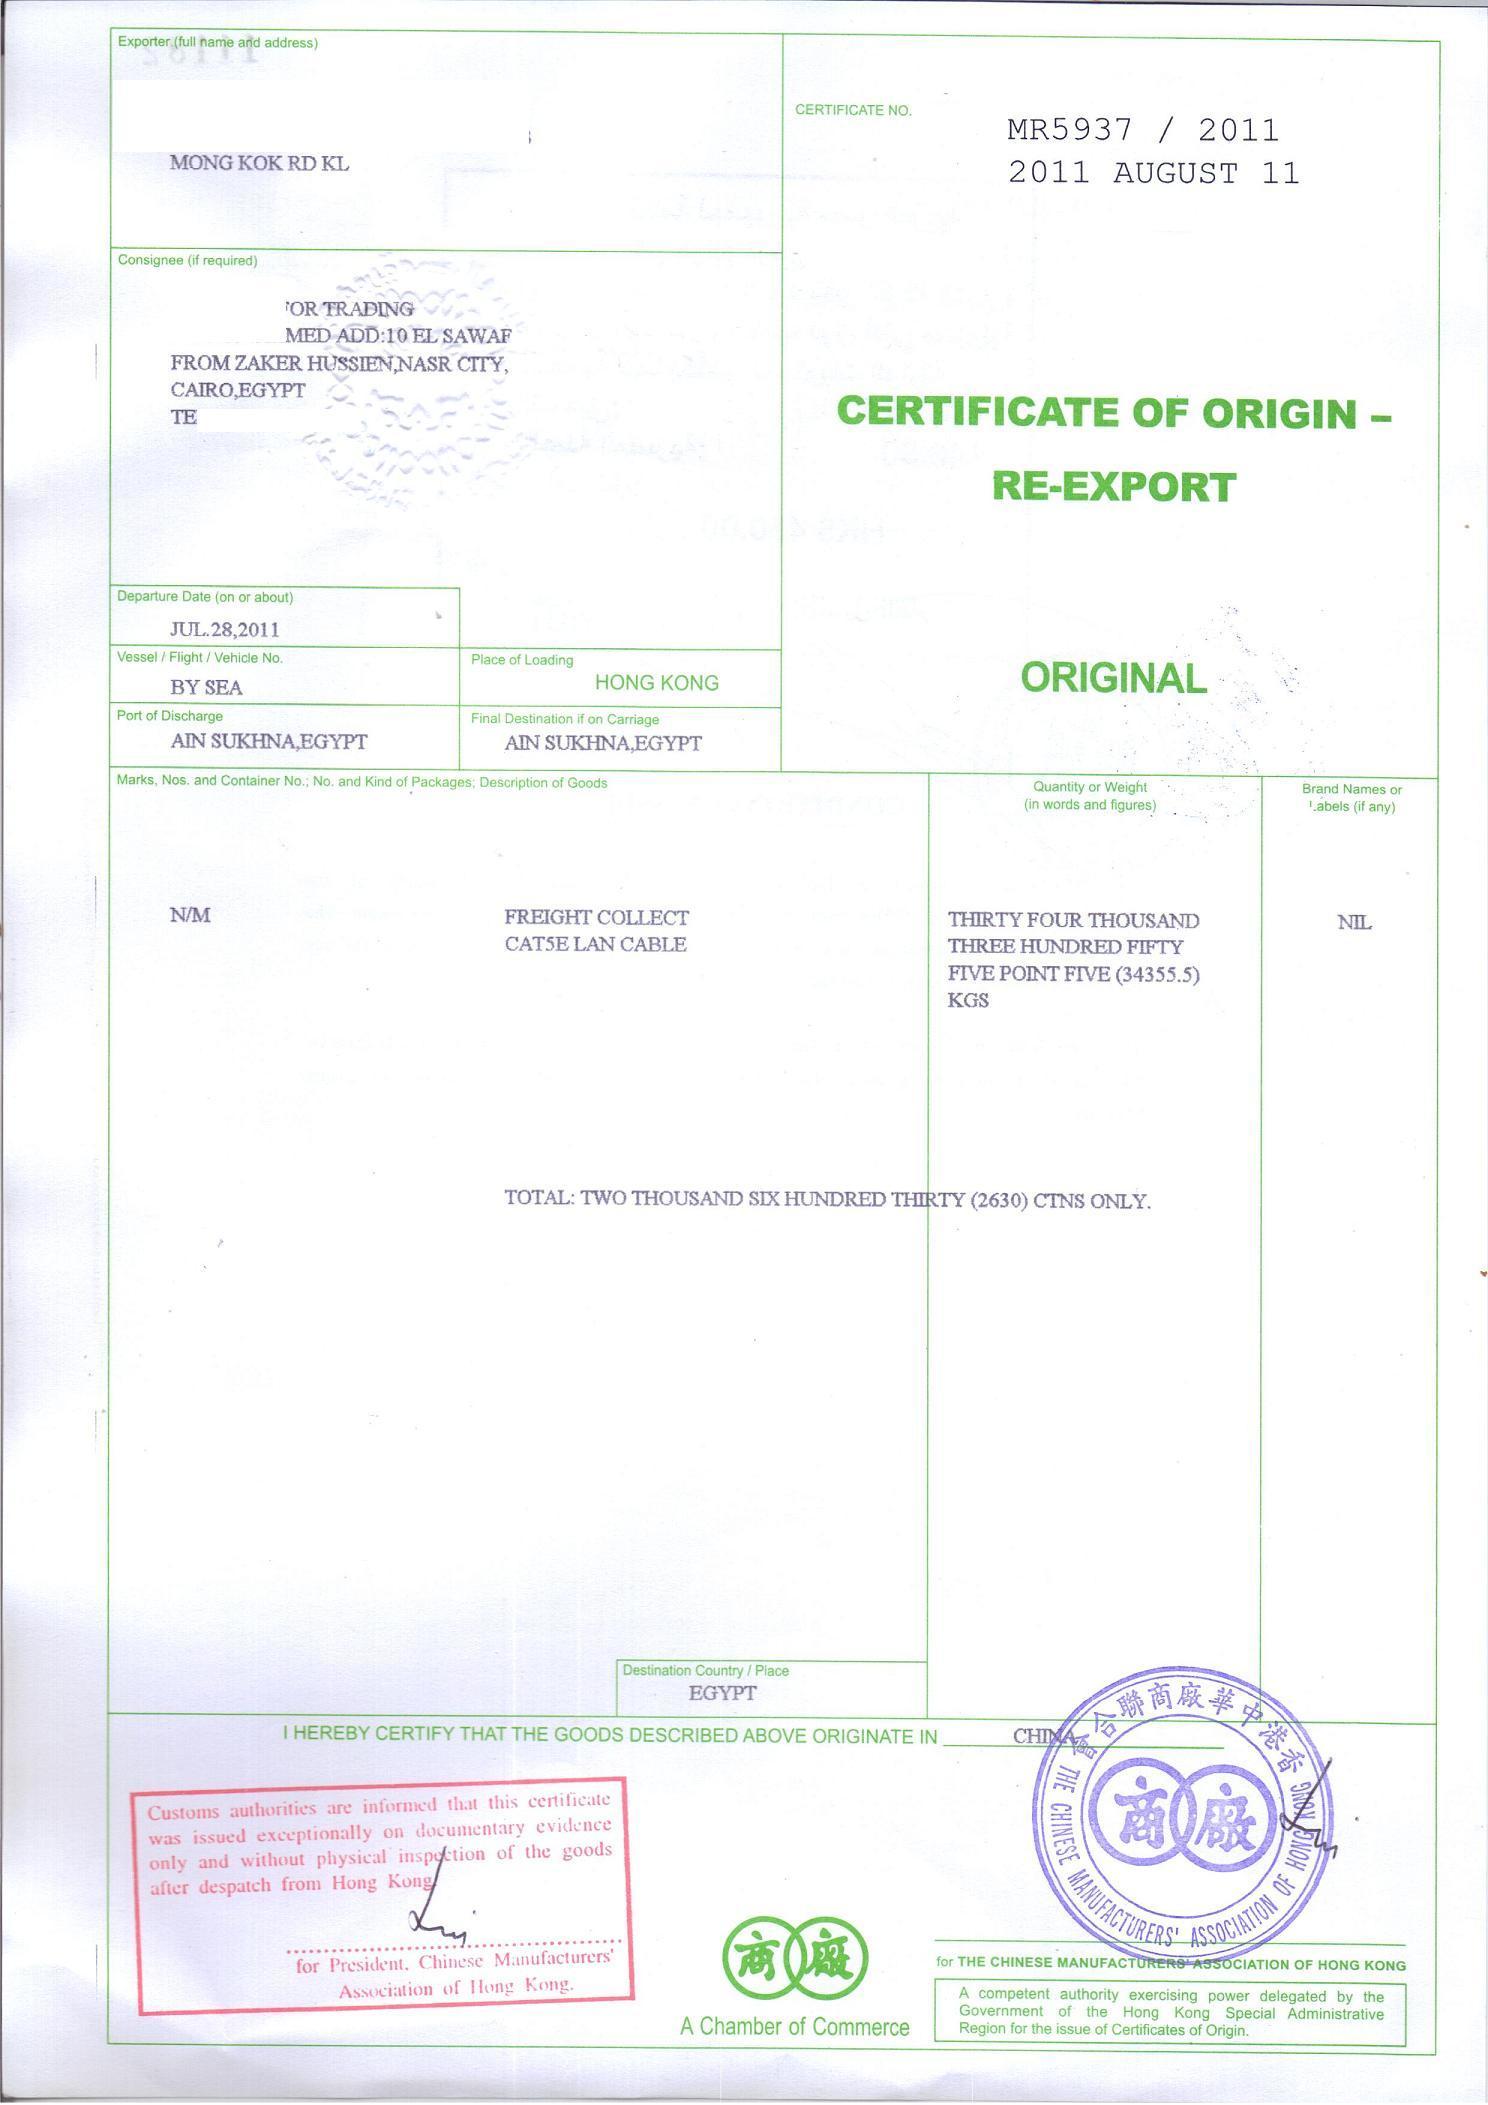 Blanket resale certificate blanket hpricot blanket re certificate hpricot com xflitez Gallery